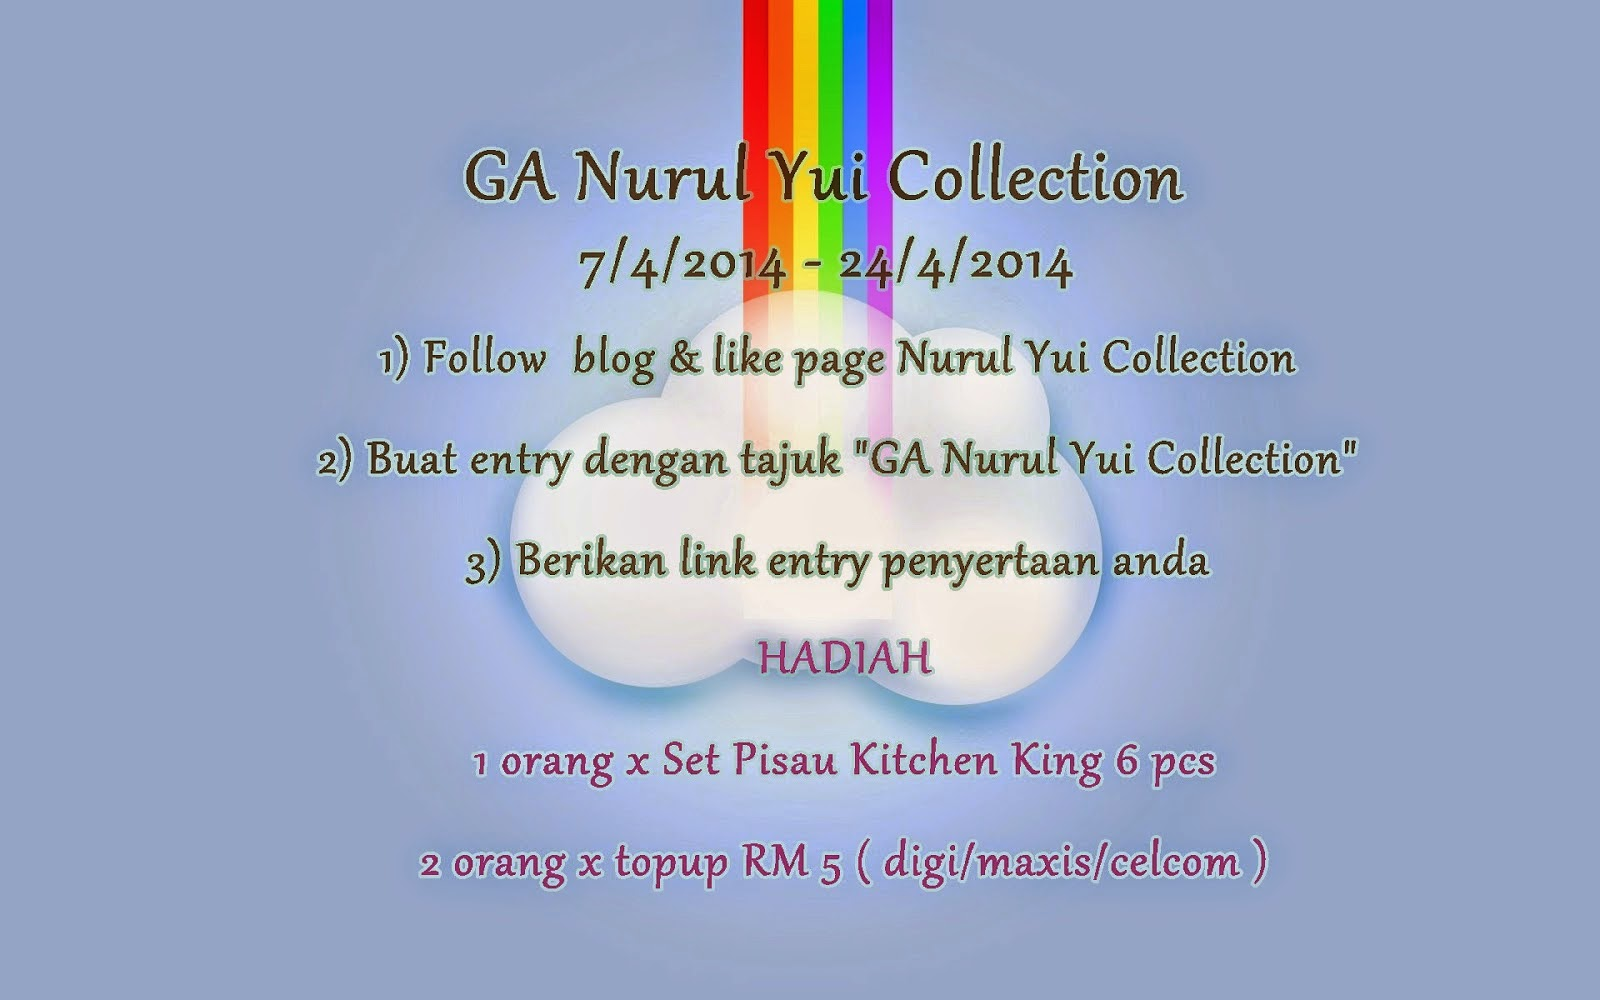 GA Nurul Yui Collection